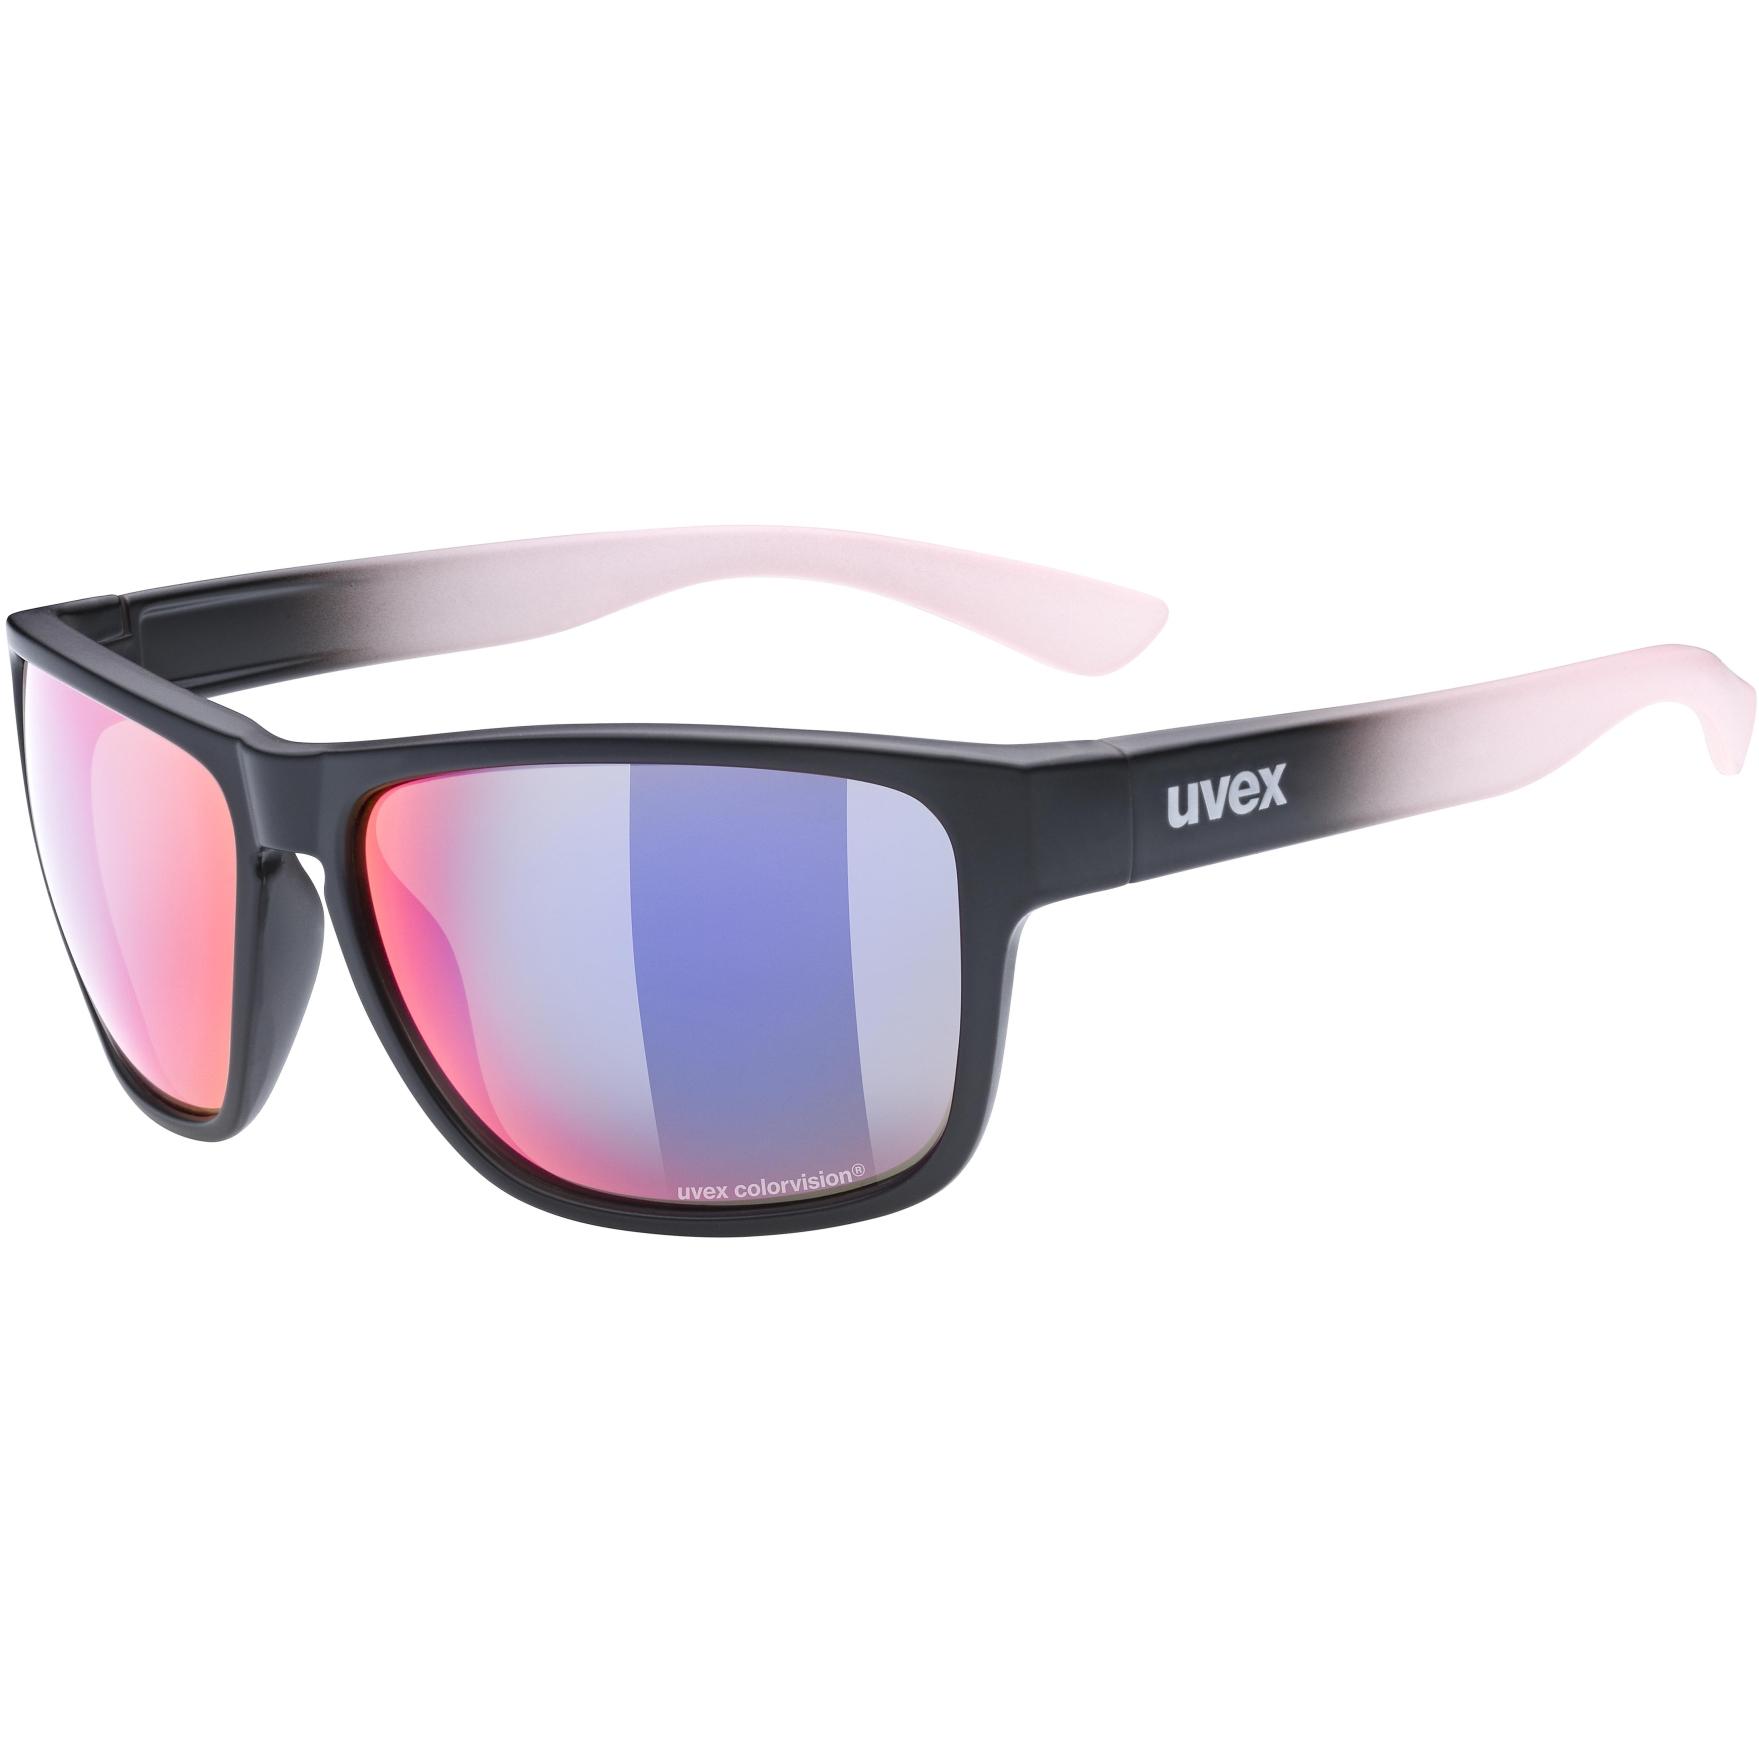 Uvex lgl 36 CV Glasses - black mat rose/colorvision mirror plasma